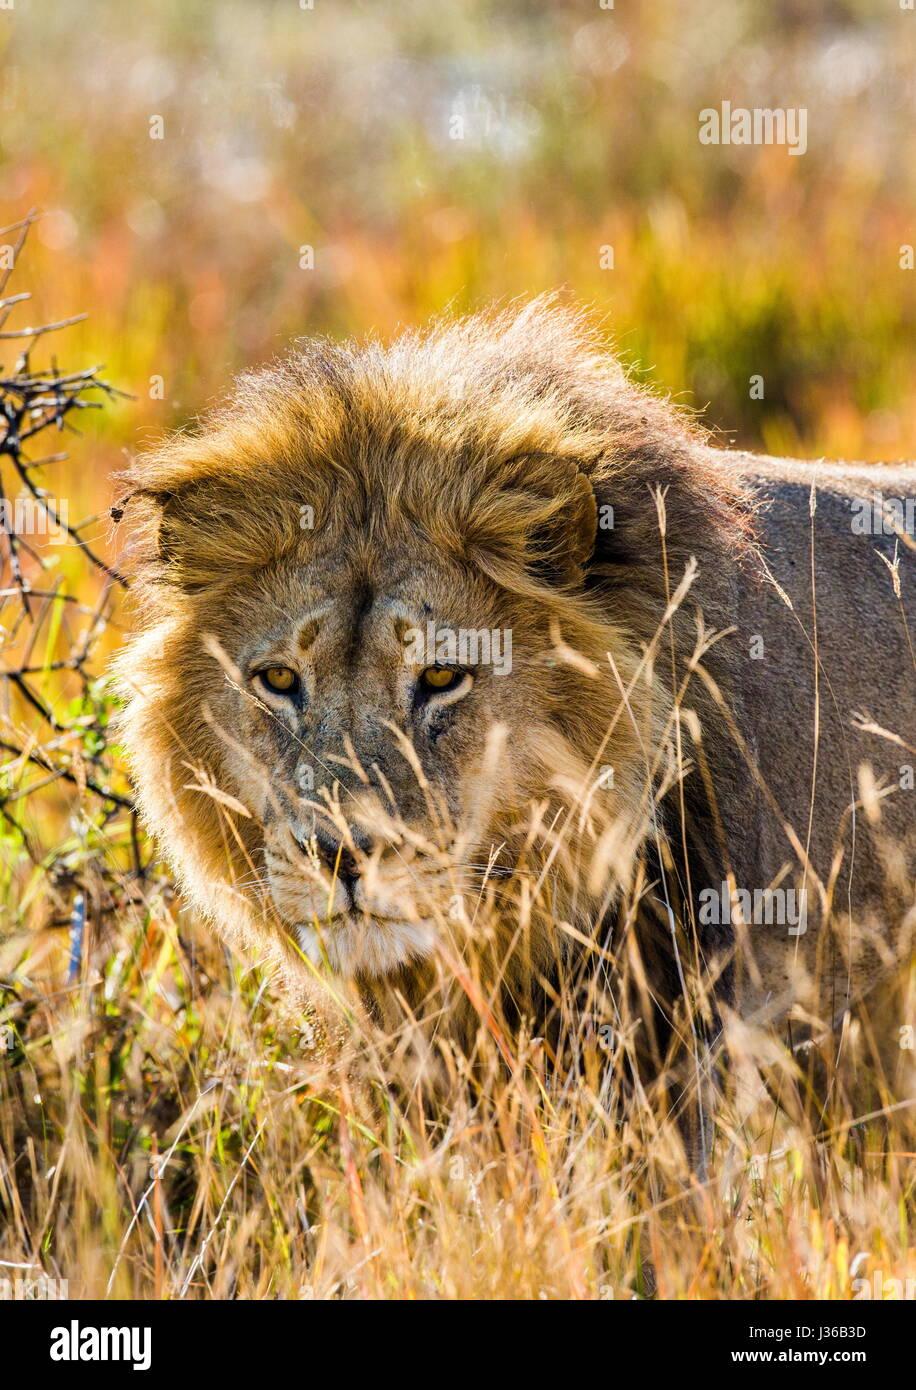 Lion in the grass. Okavango Delta. An excellent illustration. - Stock Image